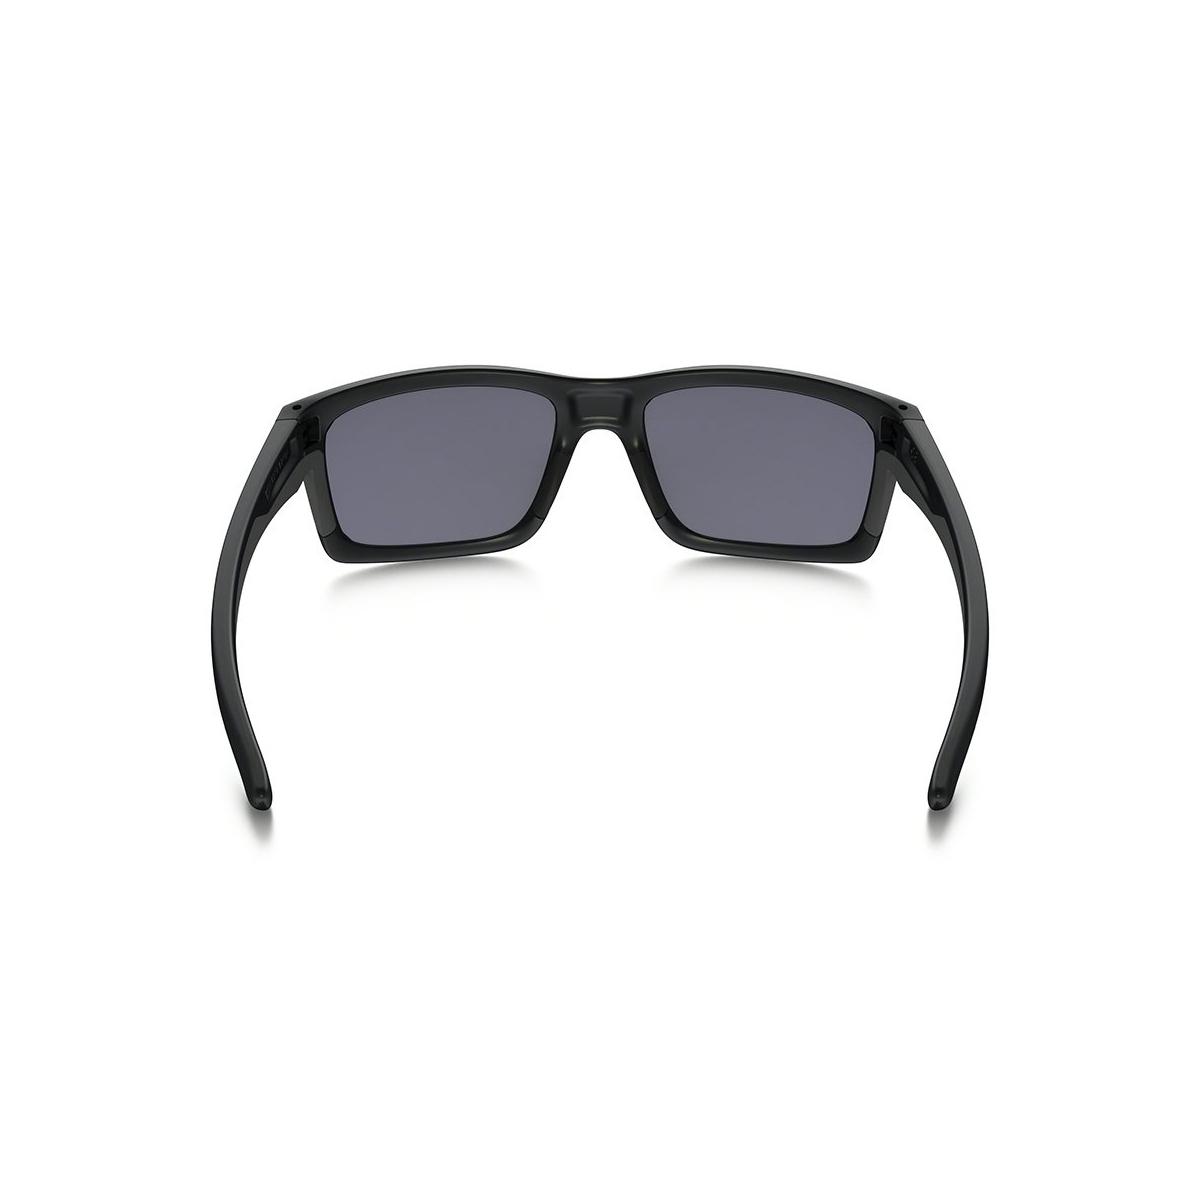 16e81f5afe3f5 Óculos Oakley Mainlink Matte Black  Lente Grey ref OO9264-01